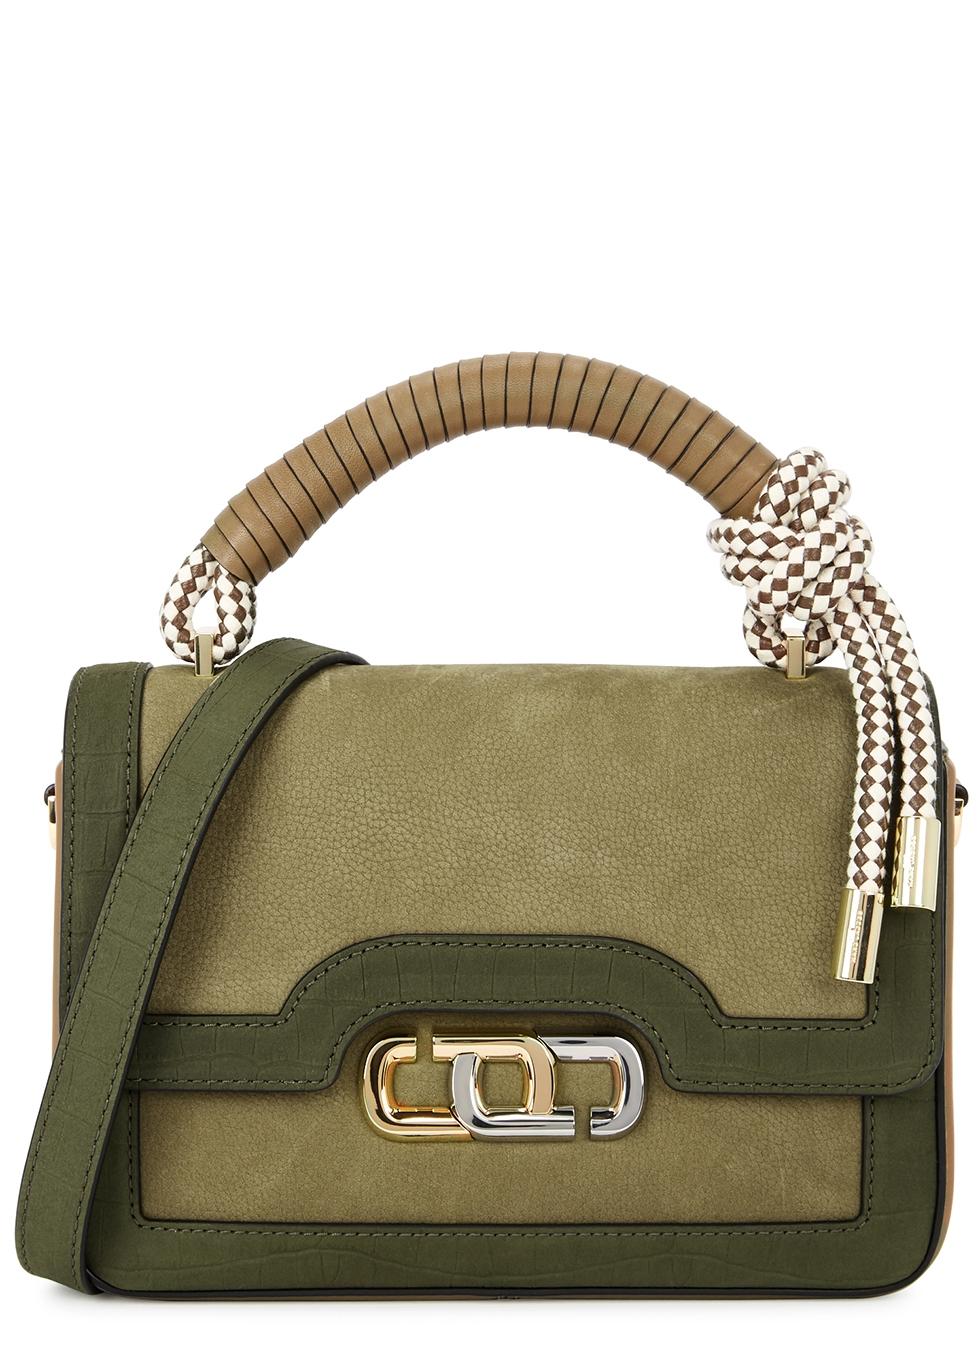 The J Link olive suede top handle bag